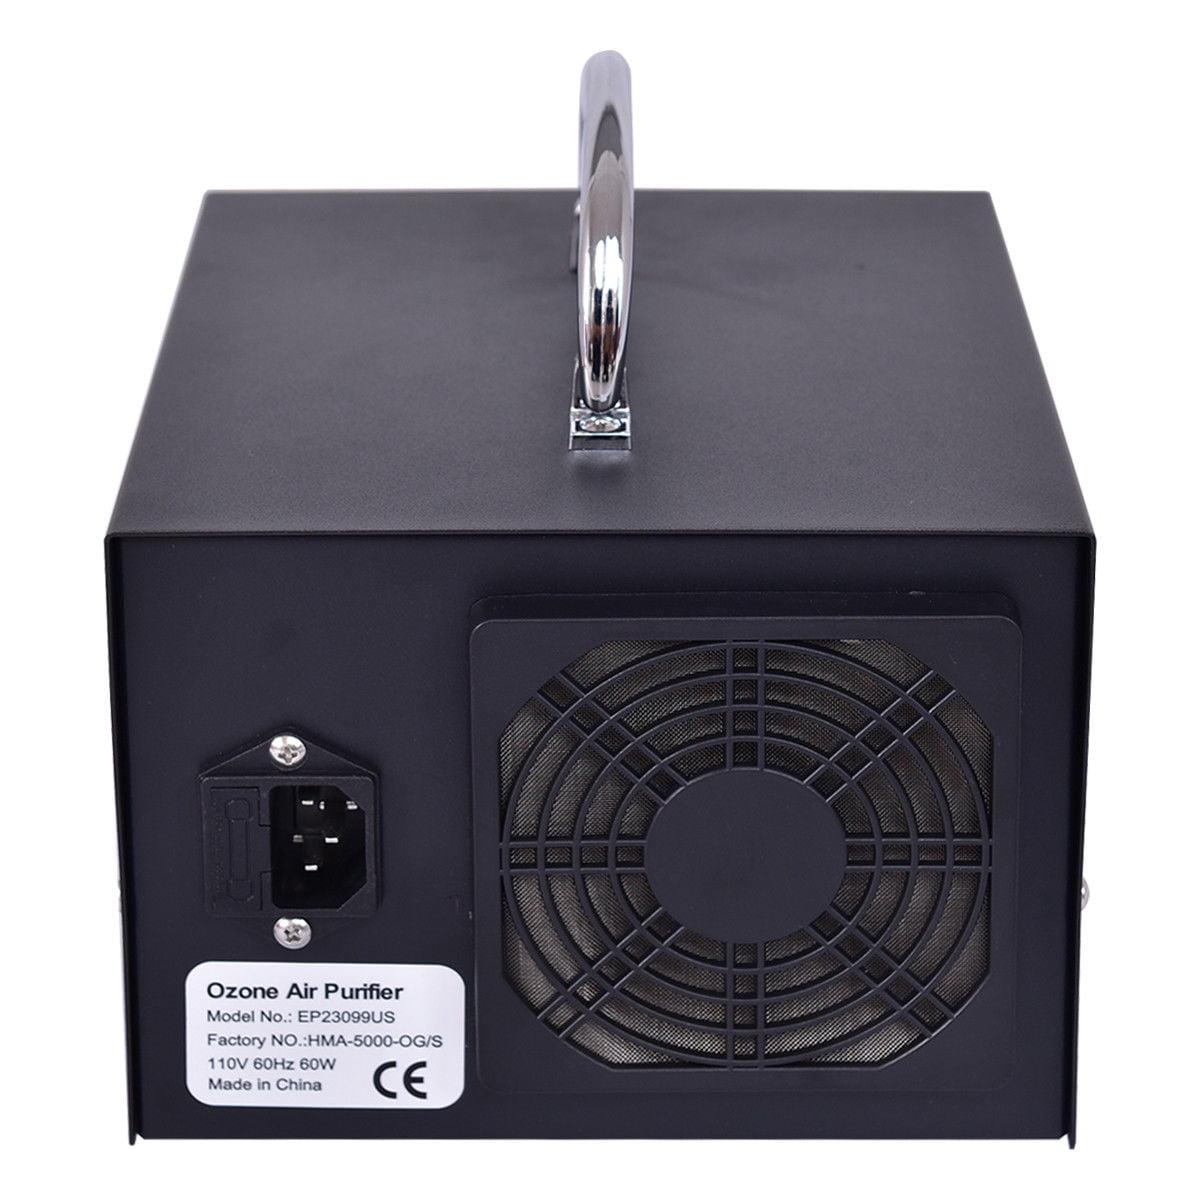 Gymax Commercial Ozone Generator 5000mg Industrial Air Purifier Deodorizer  Sterilizer